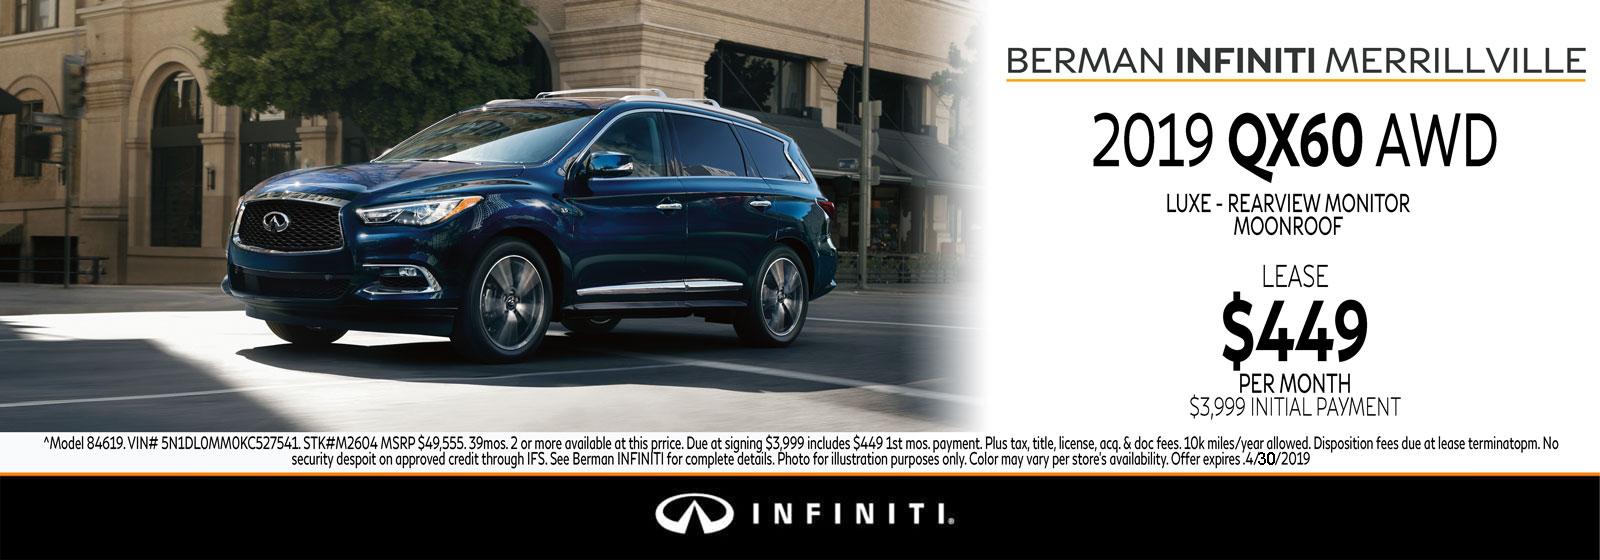 New 2019 INFINITI QX60 April Offer at Berman INFINITI of Merrillville!